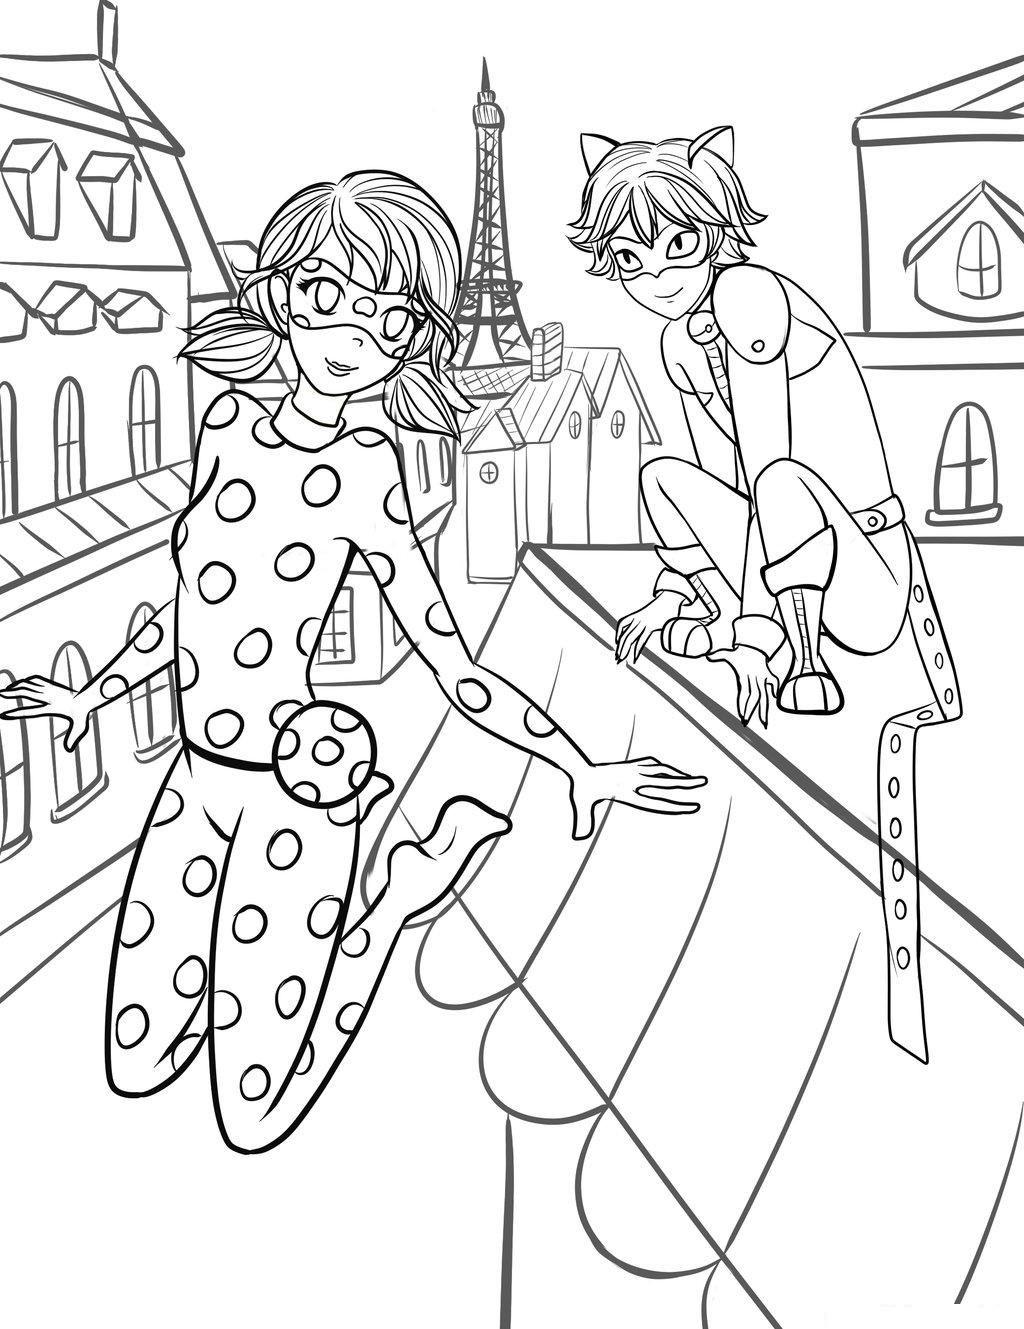 Desenho De Carnaval Para Colorir Anime Escola Educacao